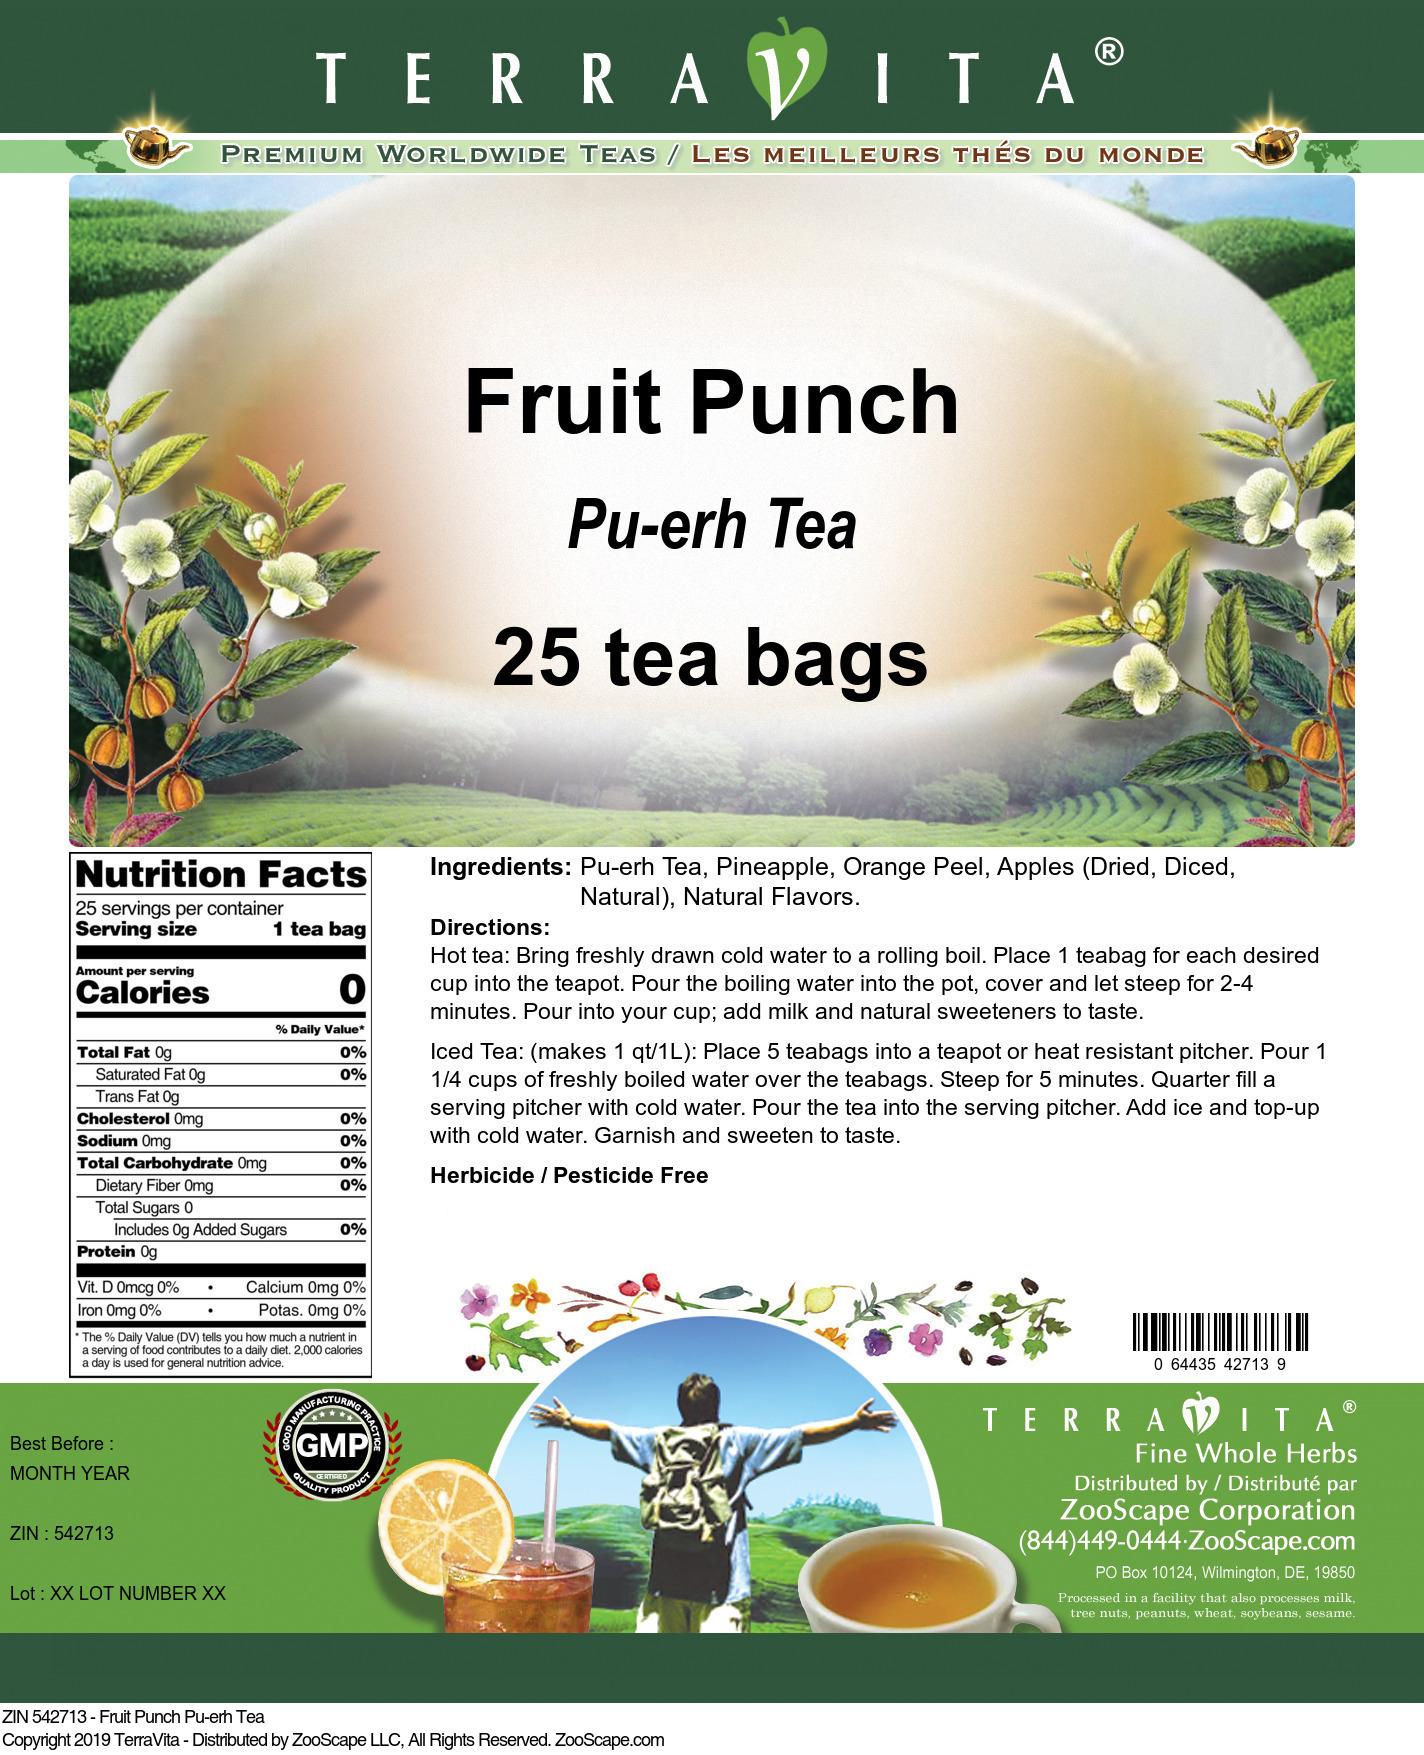 Fruit Punch Pu-erh Tea